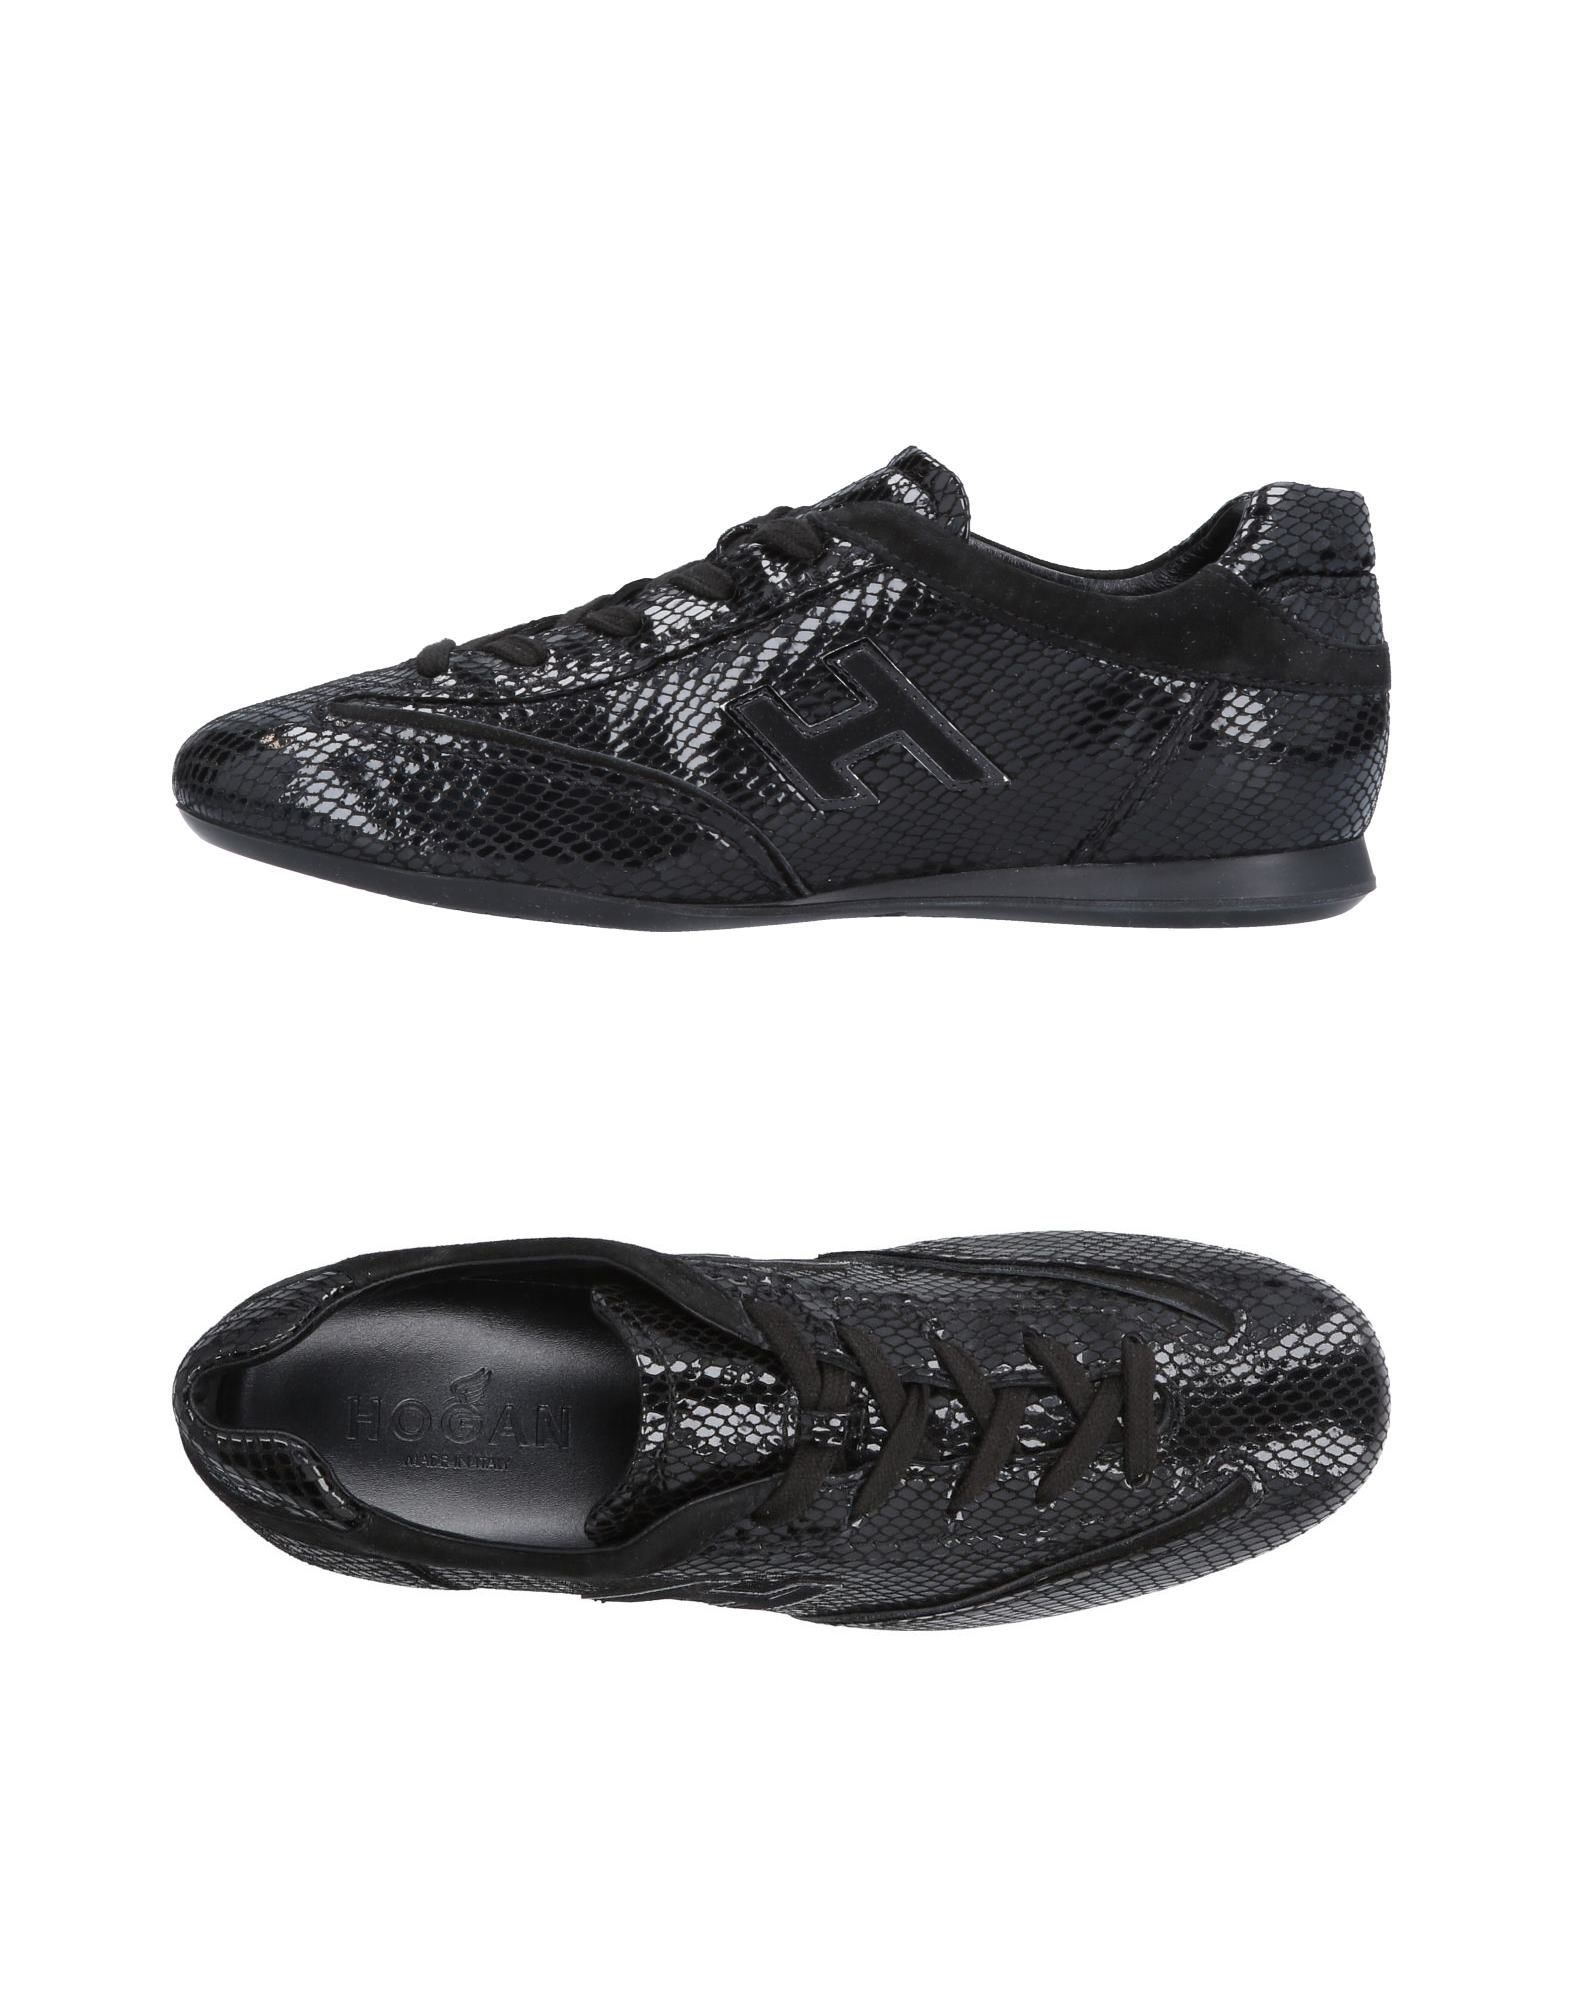 Moda Sneakers Hogan Donna - - Donna 11500620QB d028f4